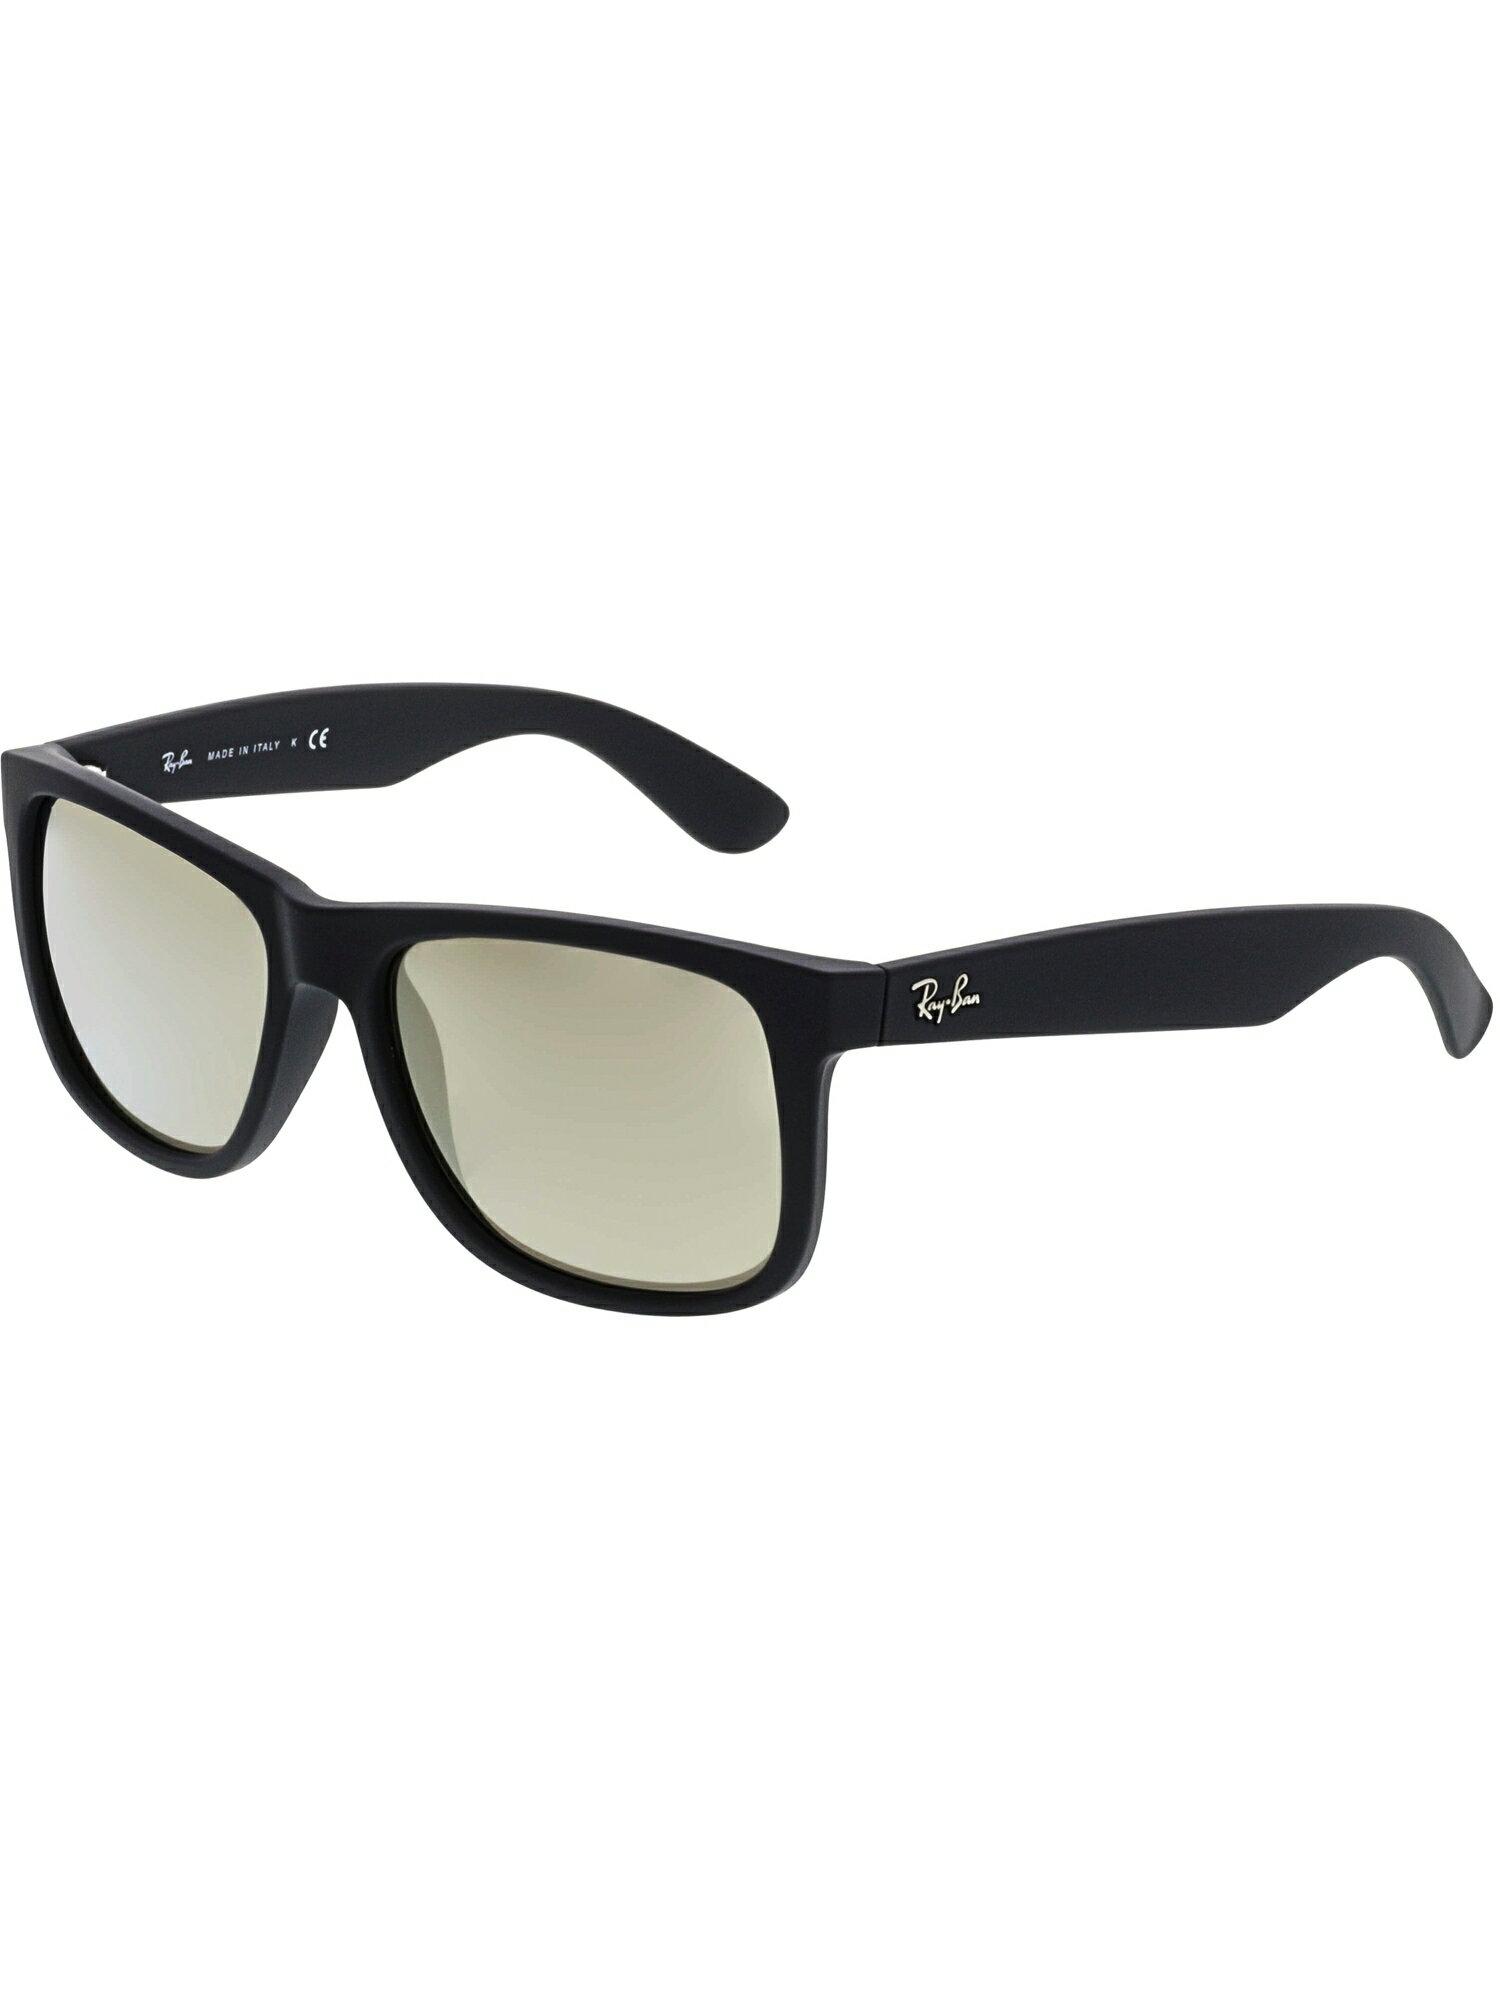 fb873f9e98 Ray-Ban Men s Justin RB4165-622 5A-54 Matte Black Rectangle Sunglasses